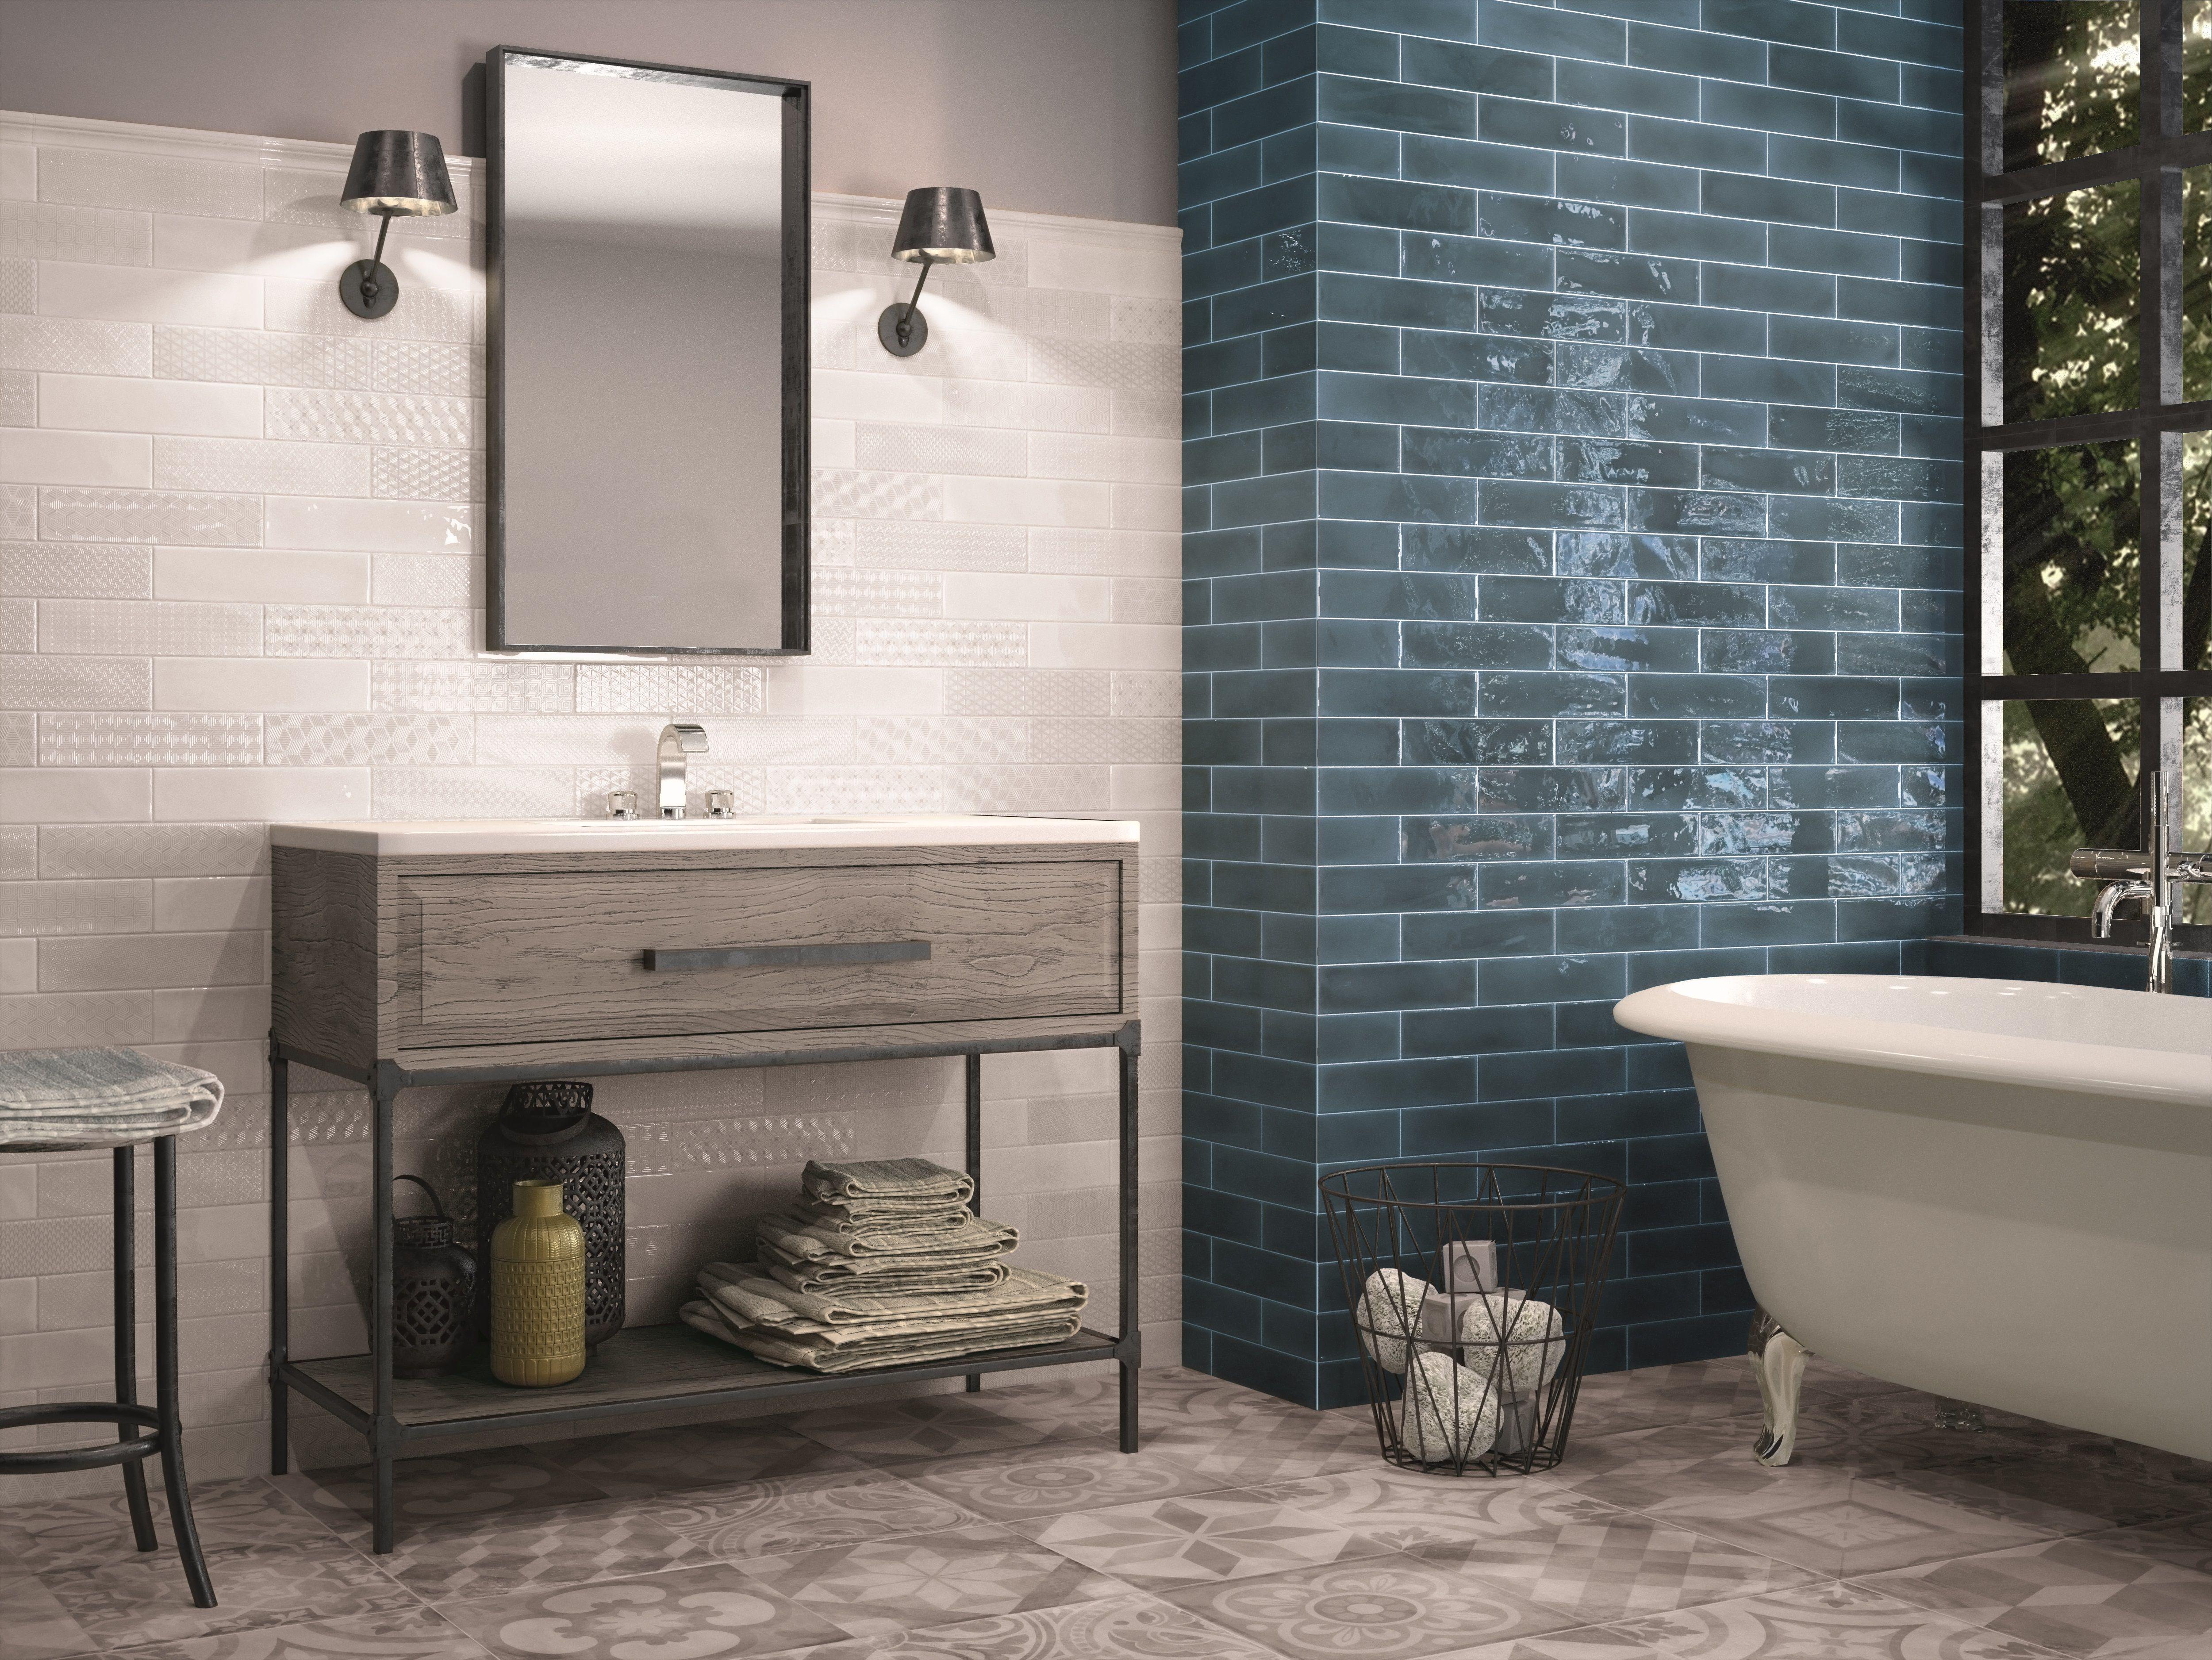 Bathroom kitchen tiles - Marine Blue Metro Tiles With White Detail Tiles And Patterned Floor Tiles